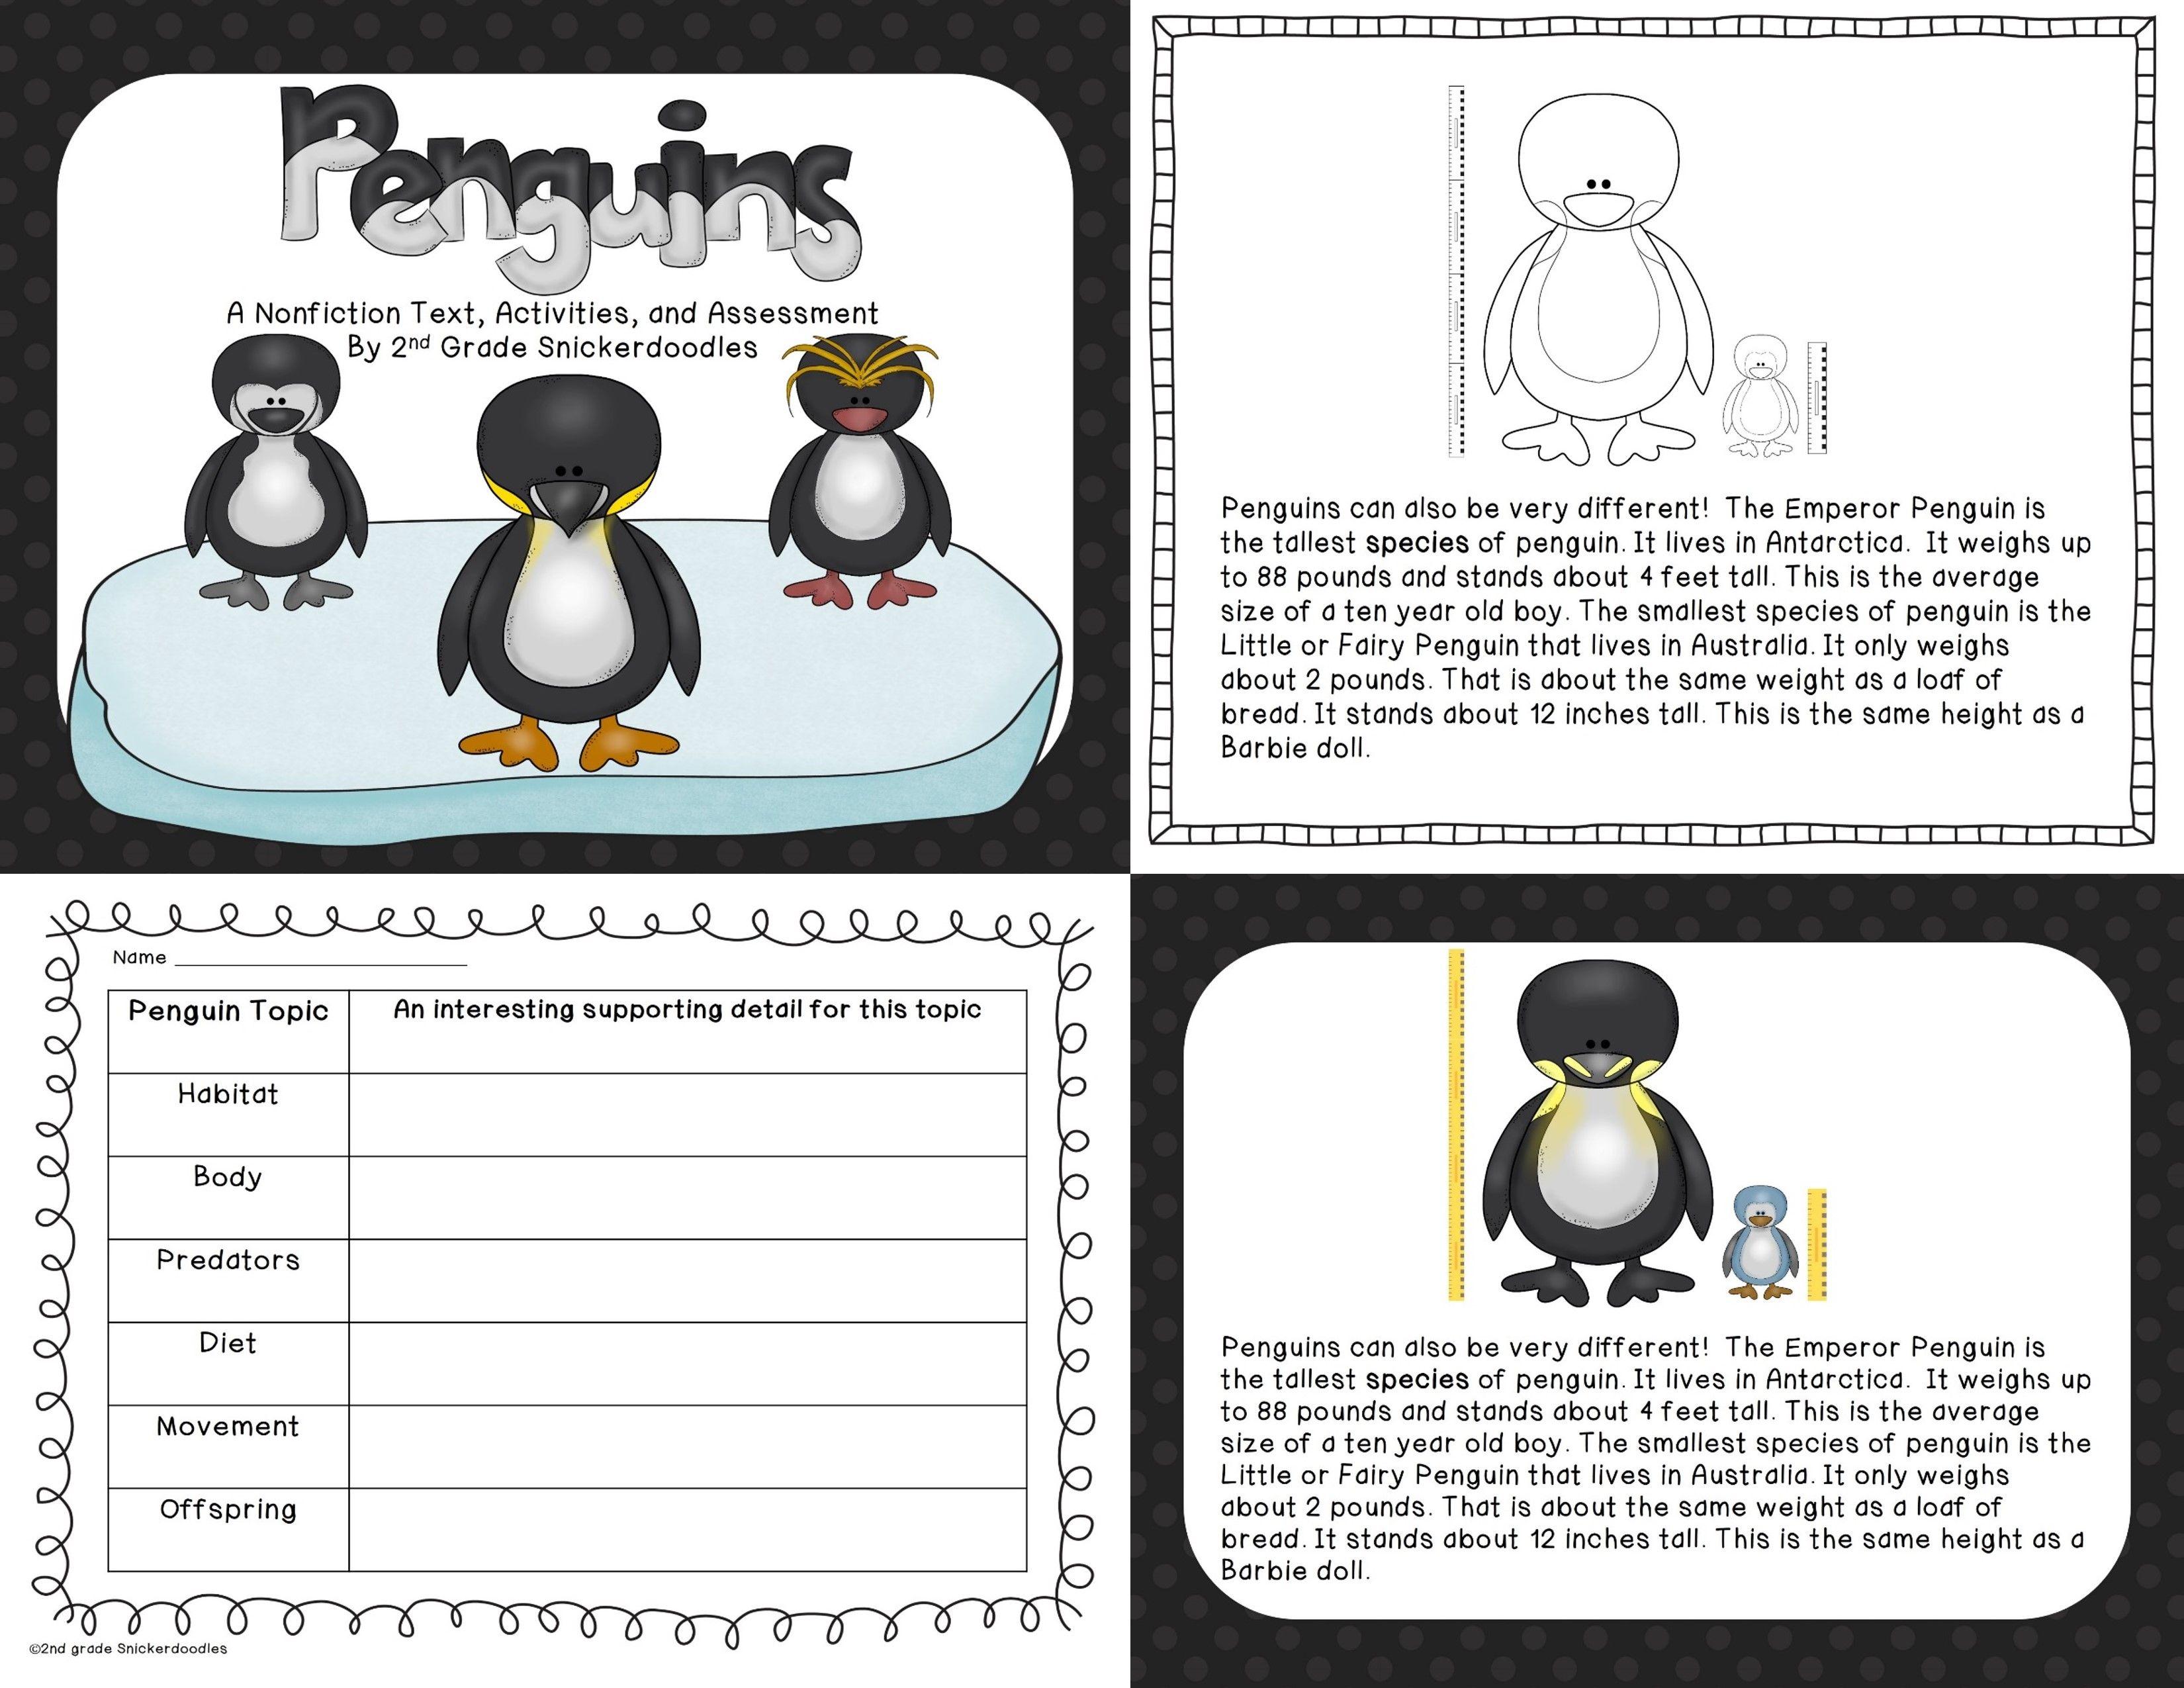 medium resolution of Penguins: A Nonfiction Text